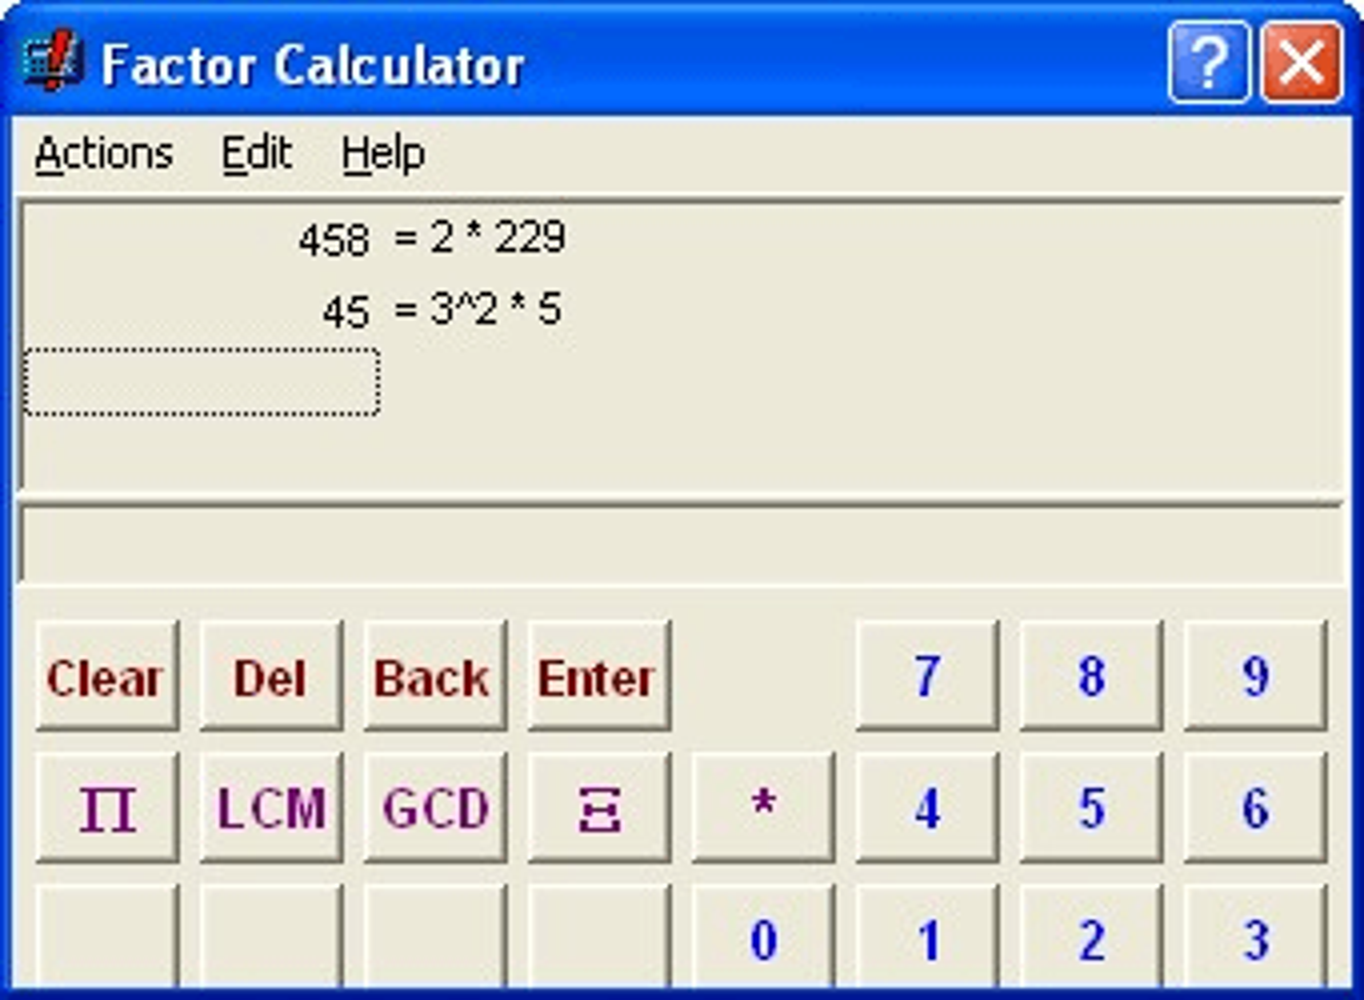 Factor Calculator